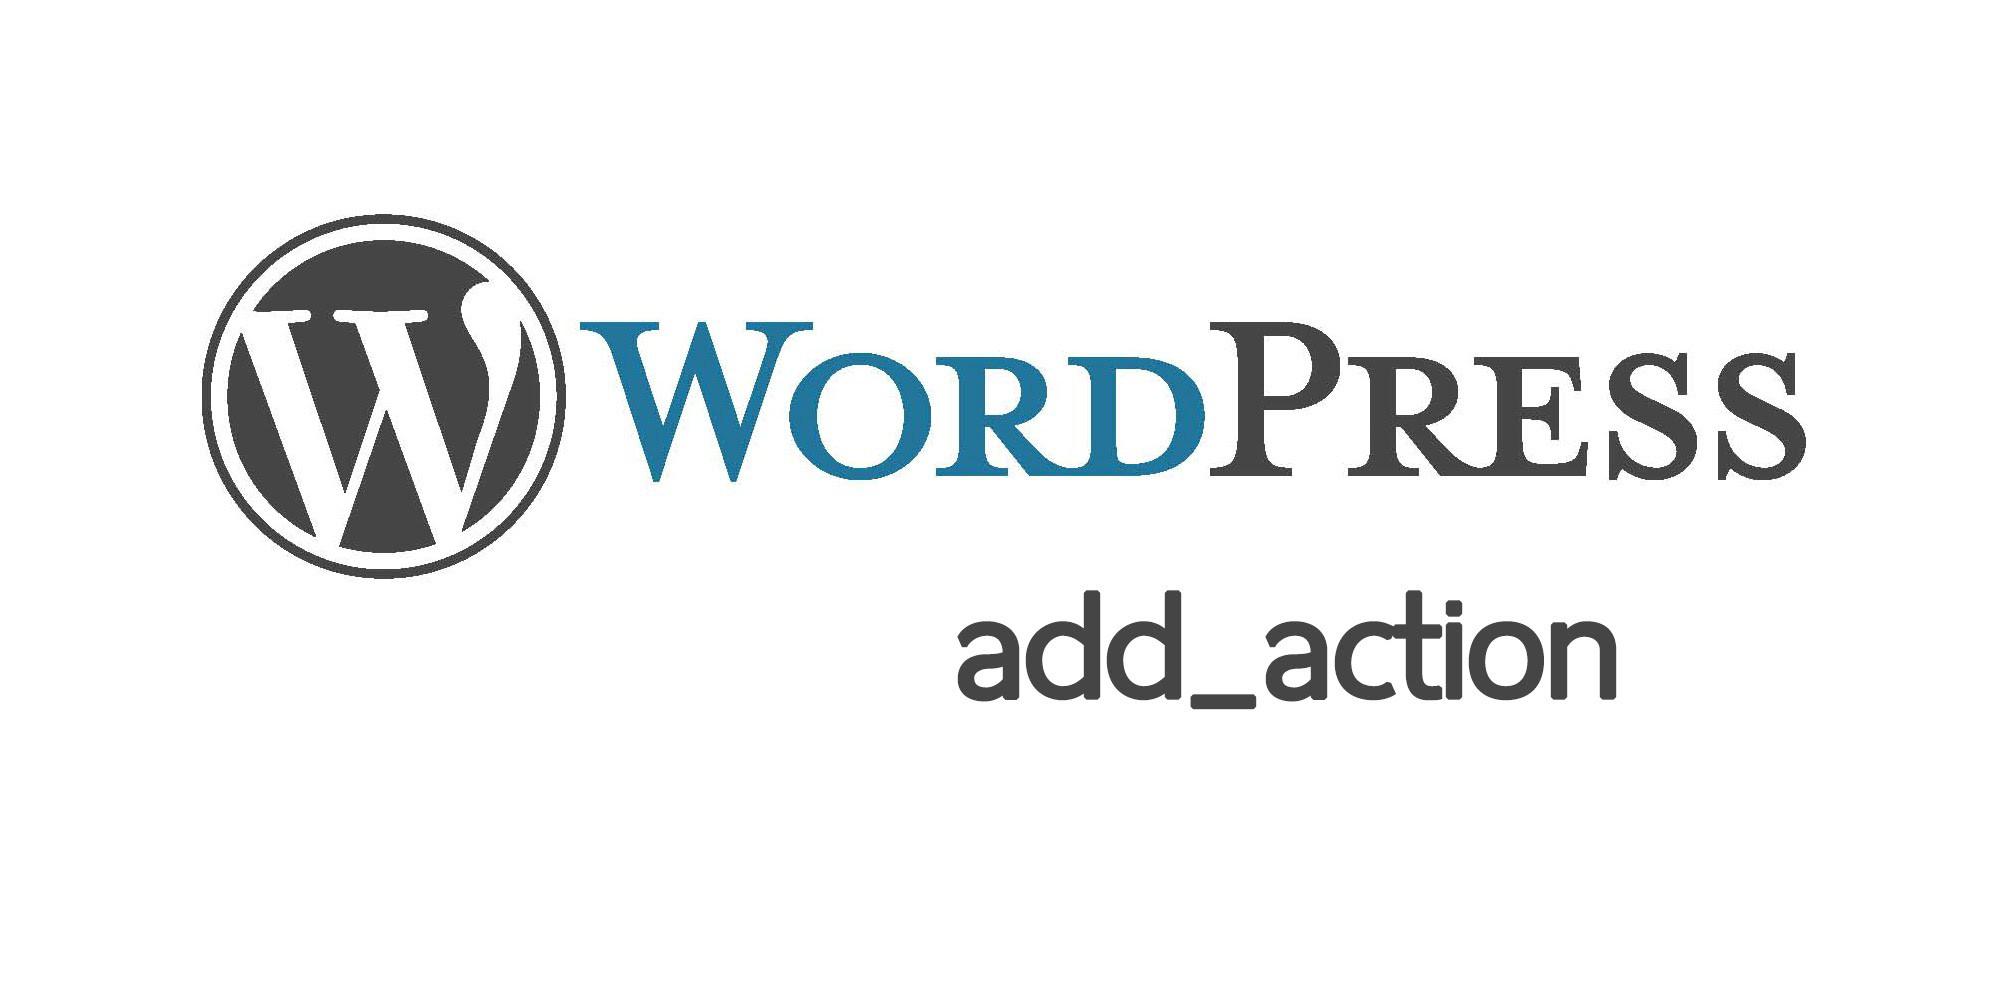 wordpress-add-action-add_filter-Create_plugin-Wordpress